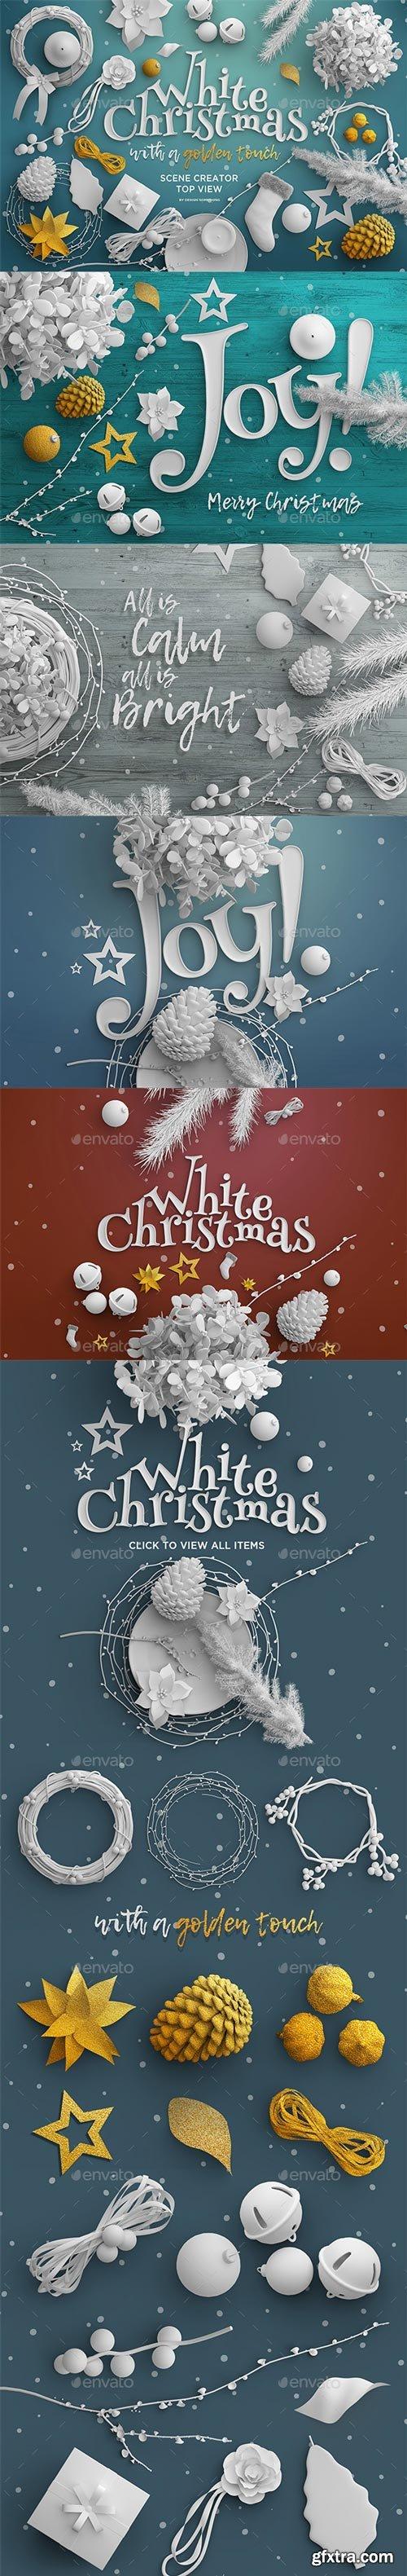 GraphicRiver - Christmas Top View Scene Creator - 22652394